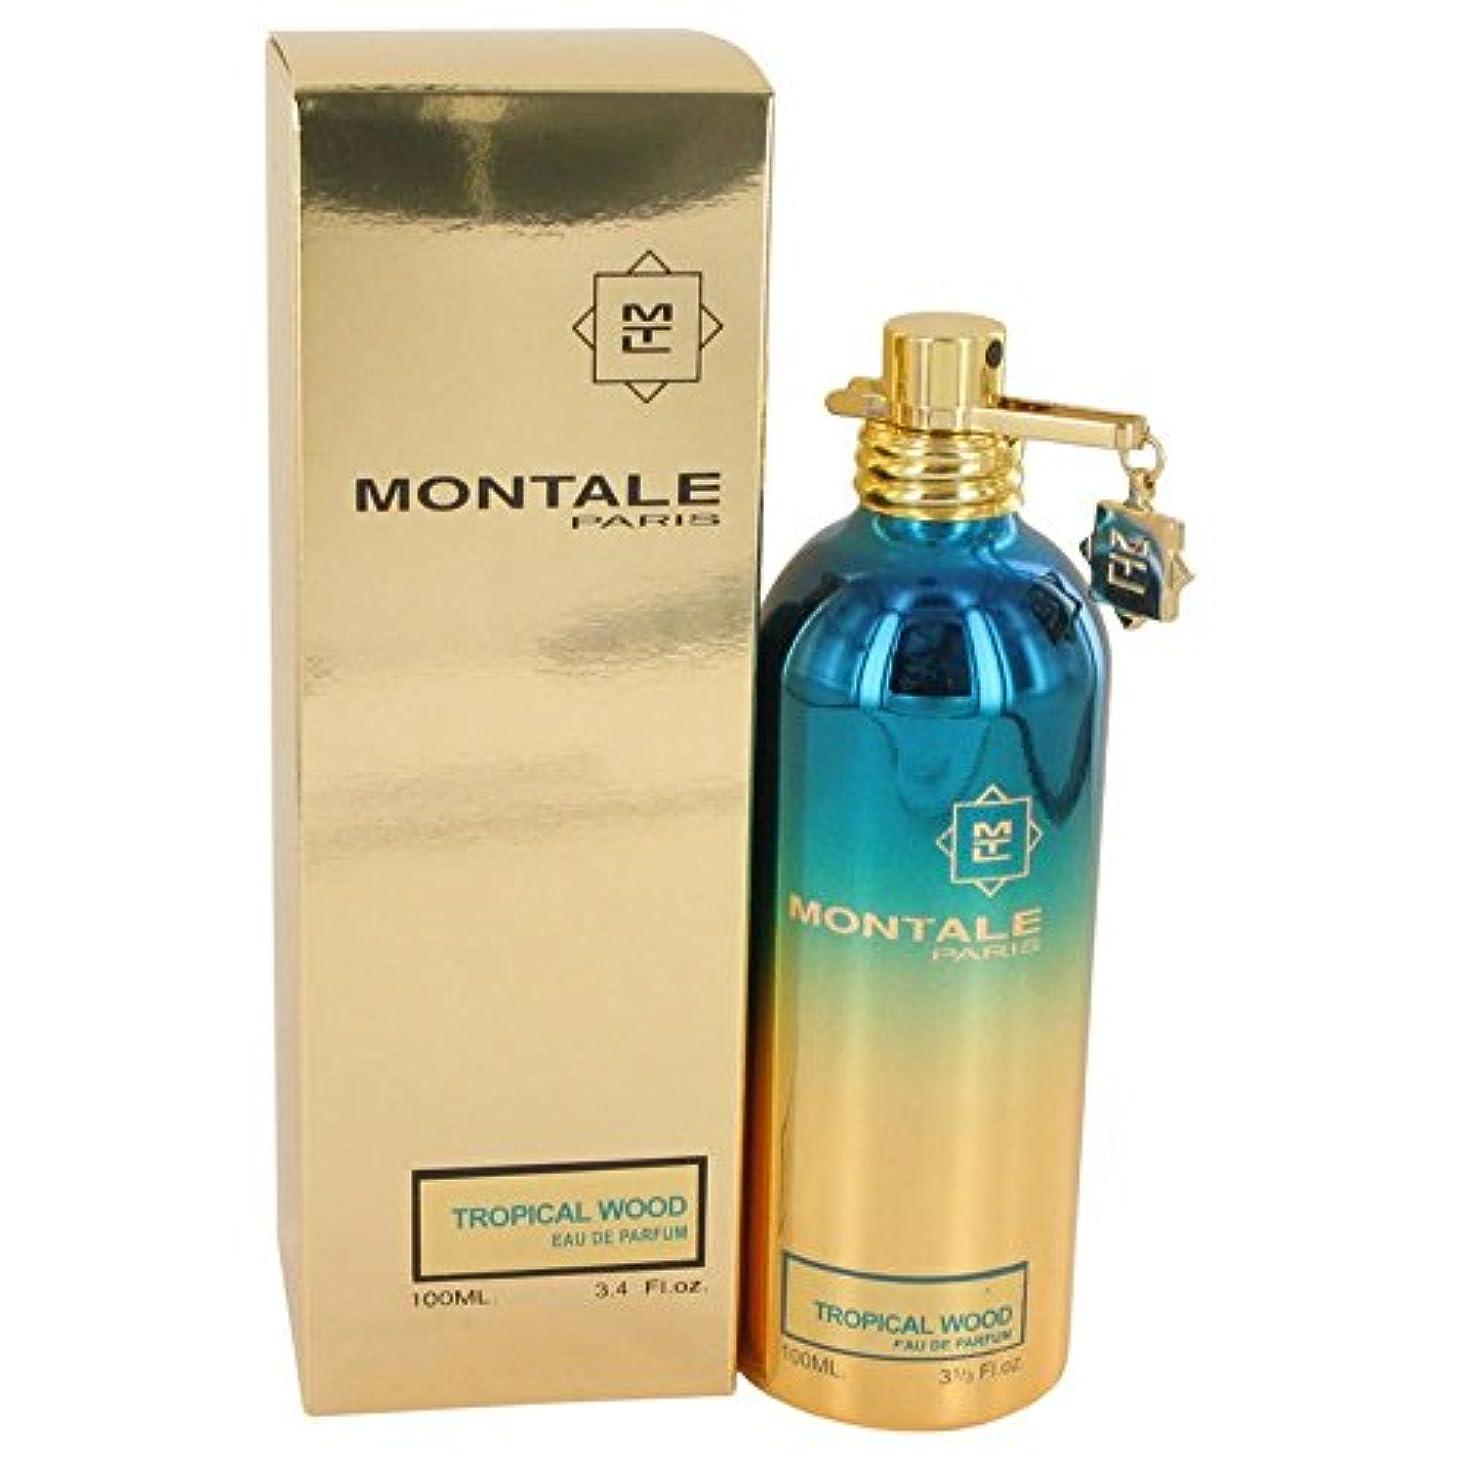 革新海里卑しいMontale Tropical Wood 100ml/3.4oz Eau De Parfum Spray Unisex Perfume Fragrance